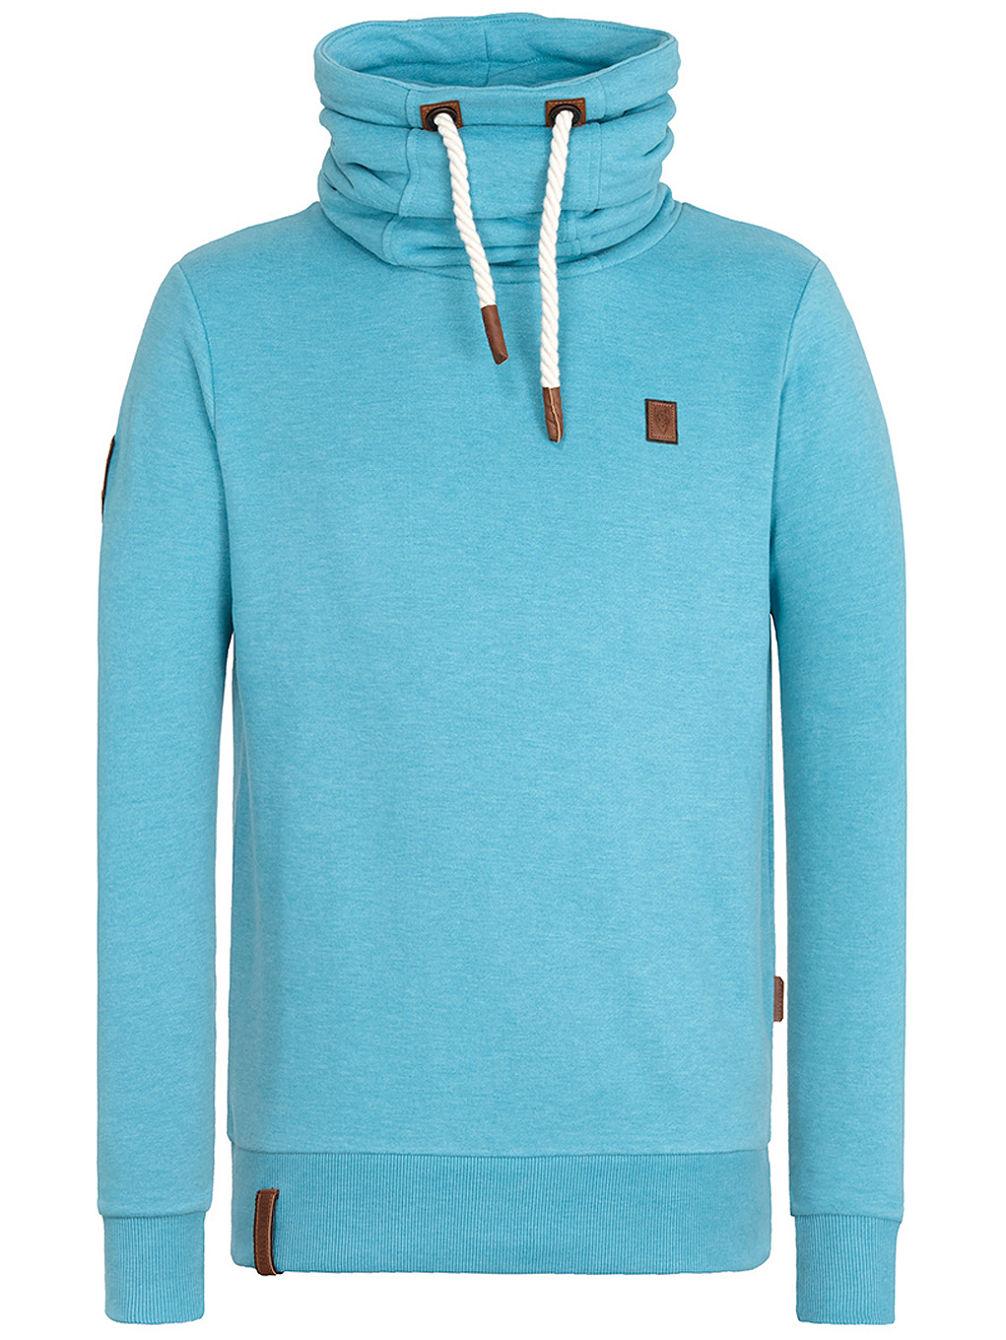 naketano-banane-oder-gurke-sweater